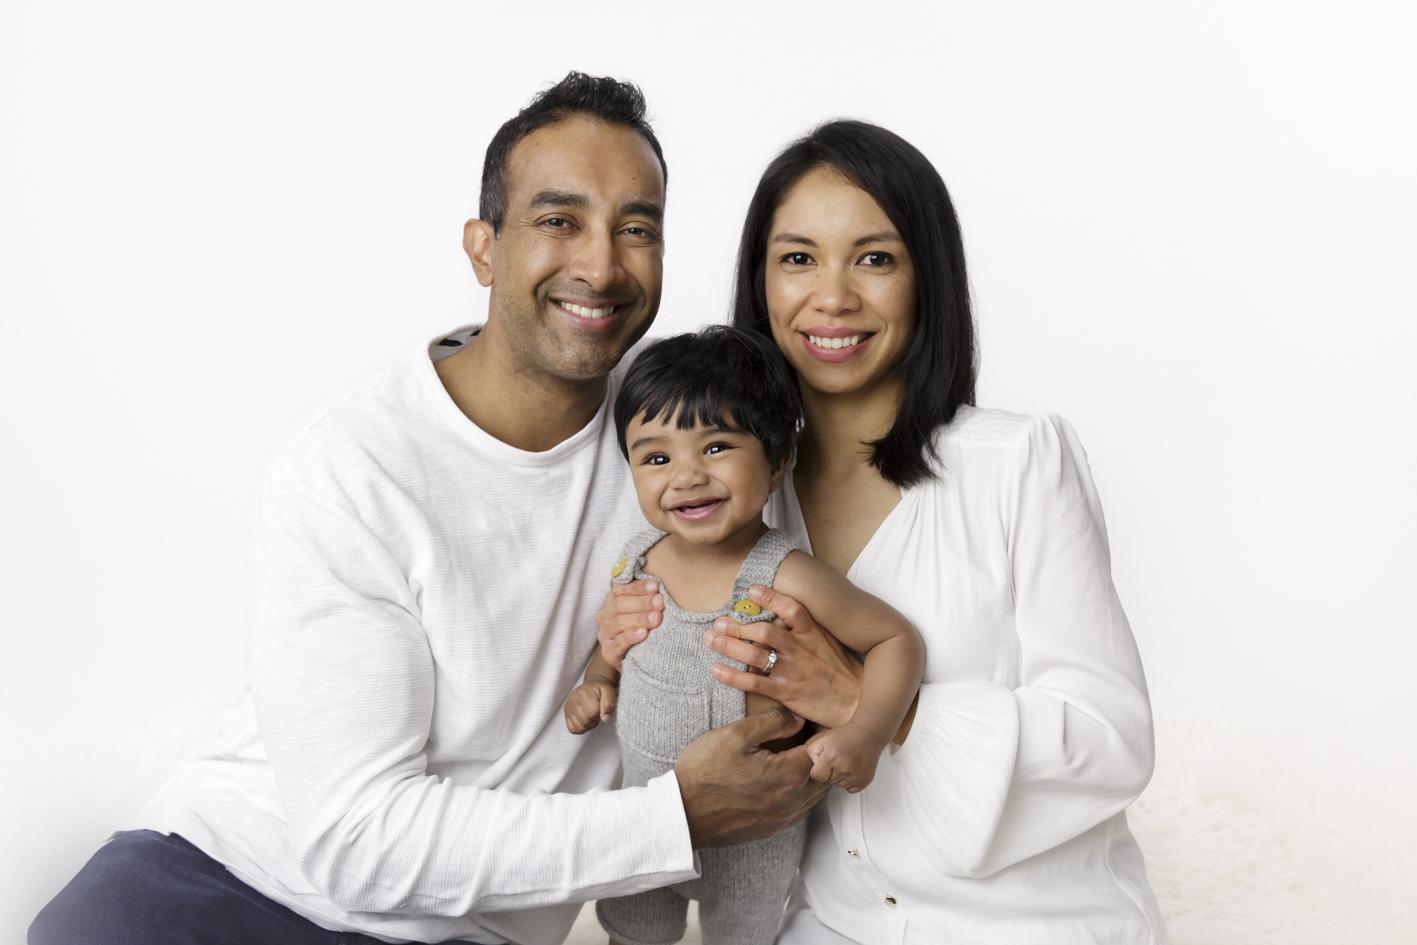 happy family photo with baby boy